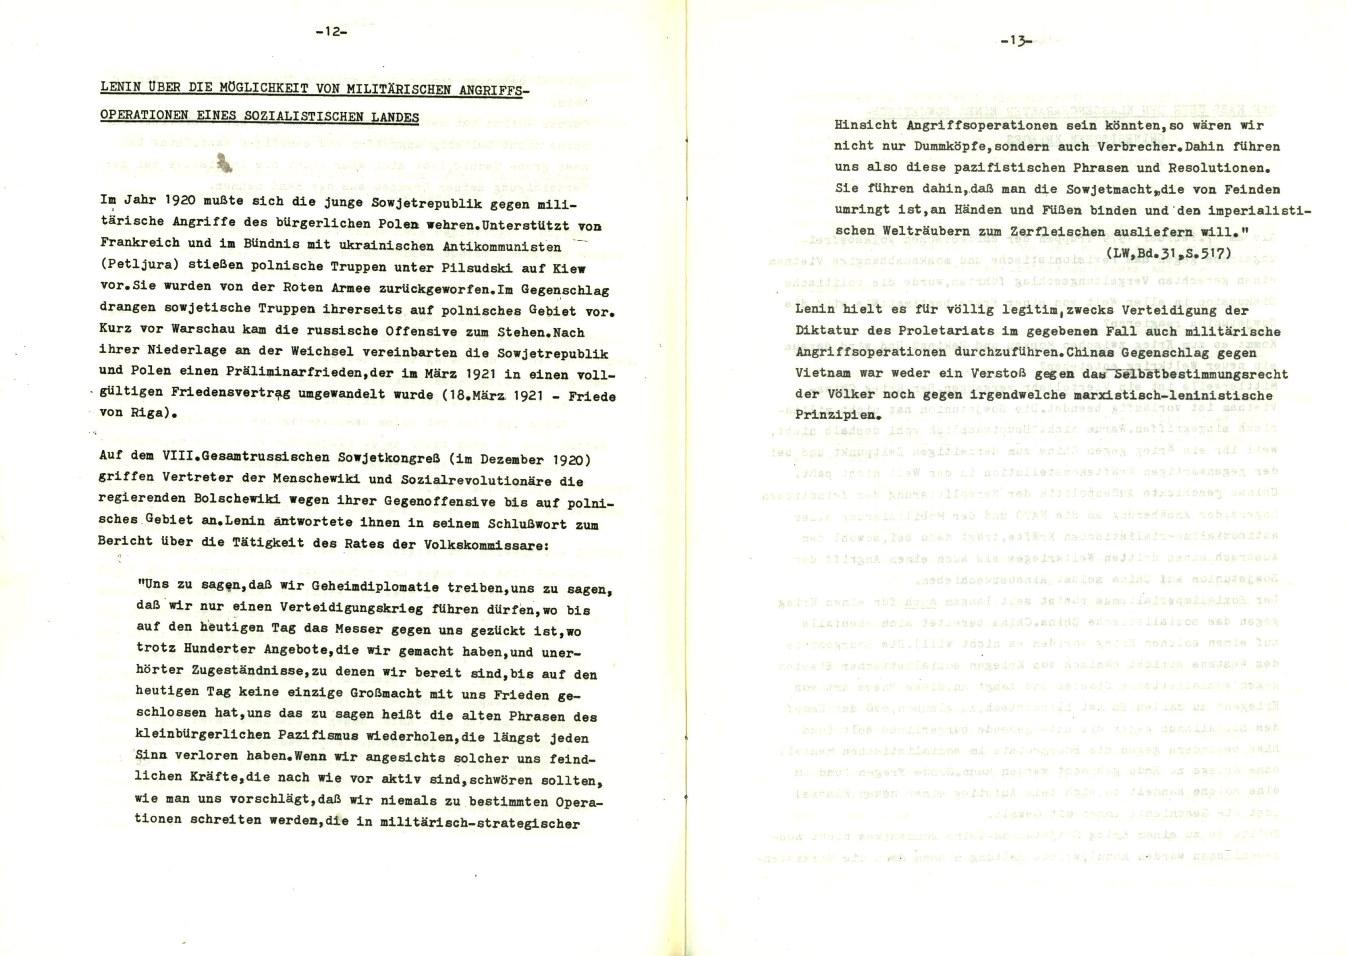 Muenchen_Kampf_dem_Revisionismus_1979_10_07